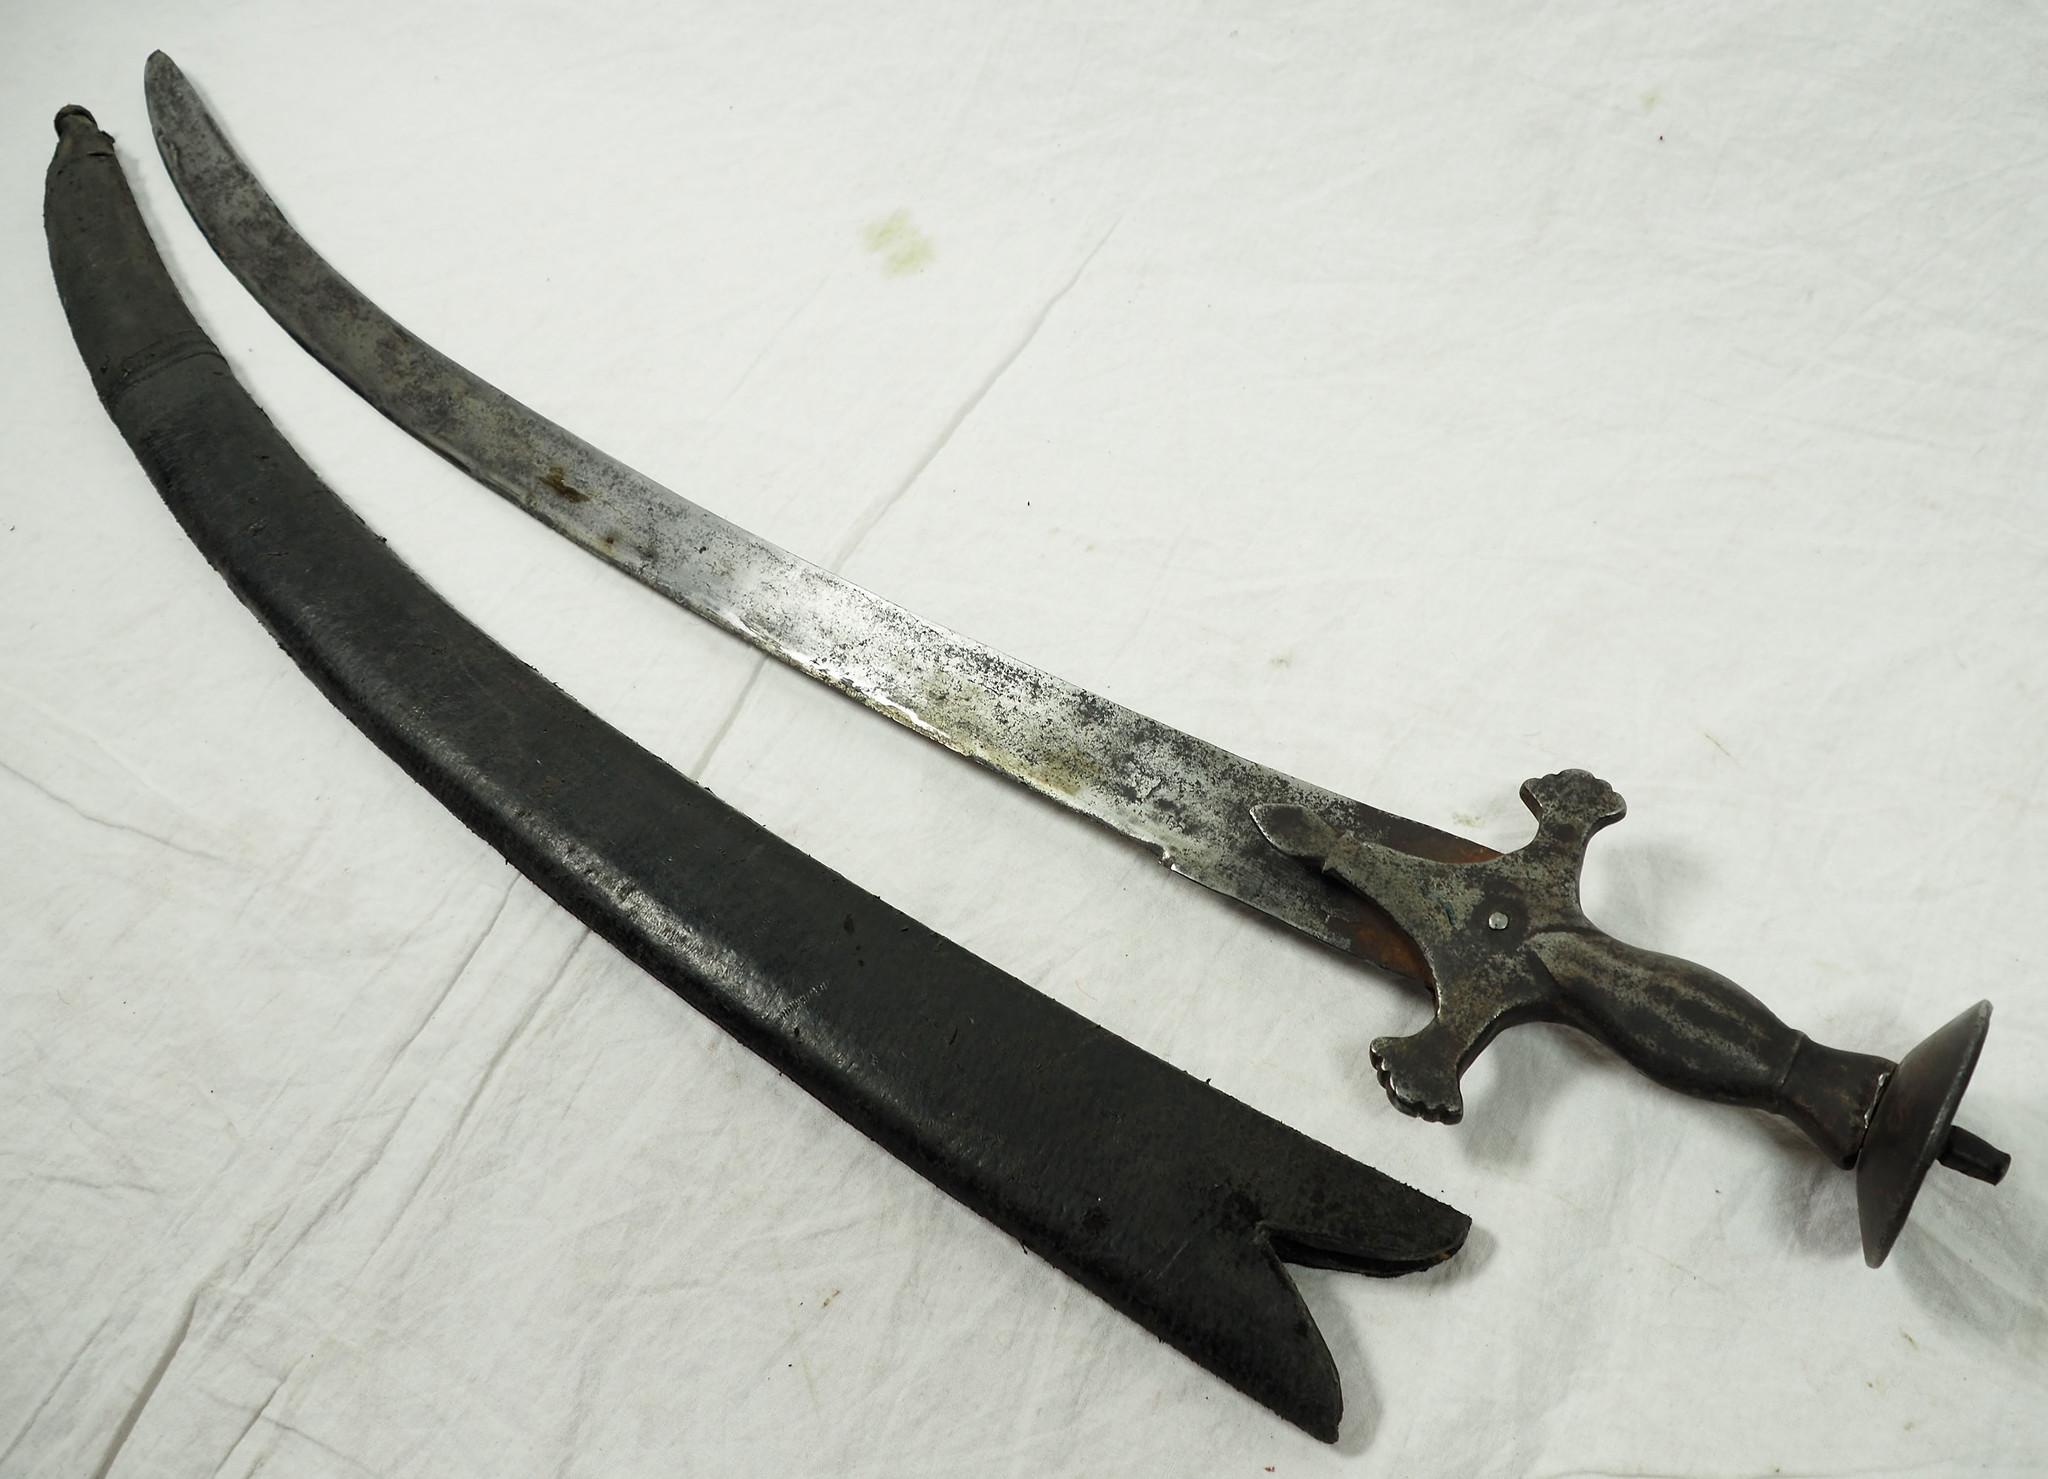 Antique islamic Sword Shamshir from Afghanistan No: 19/G